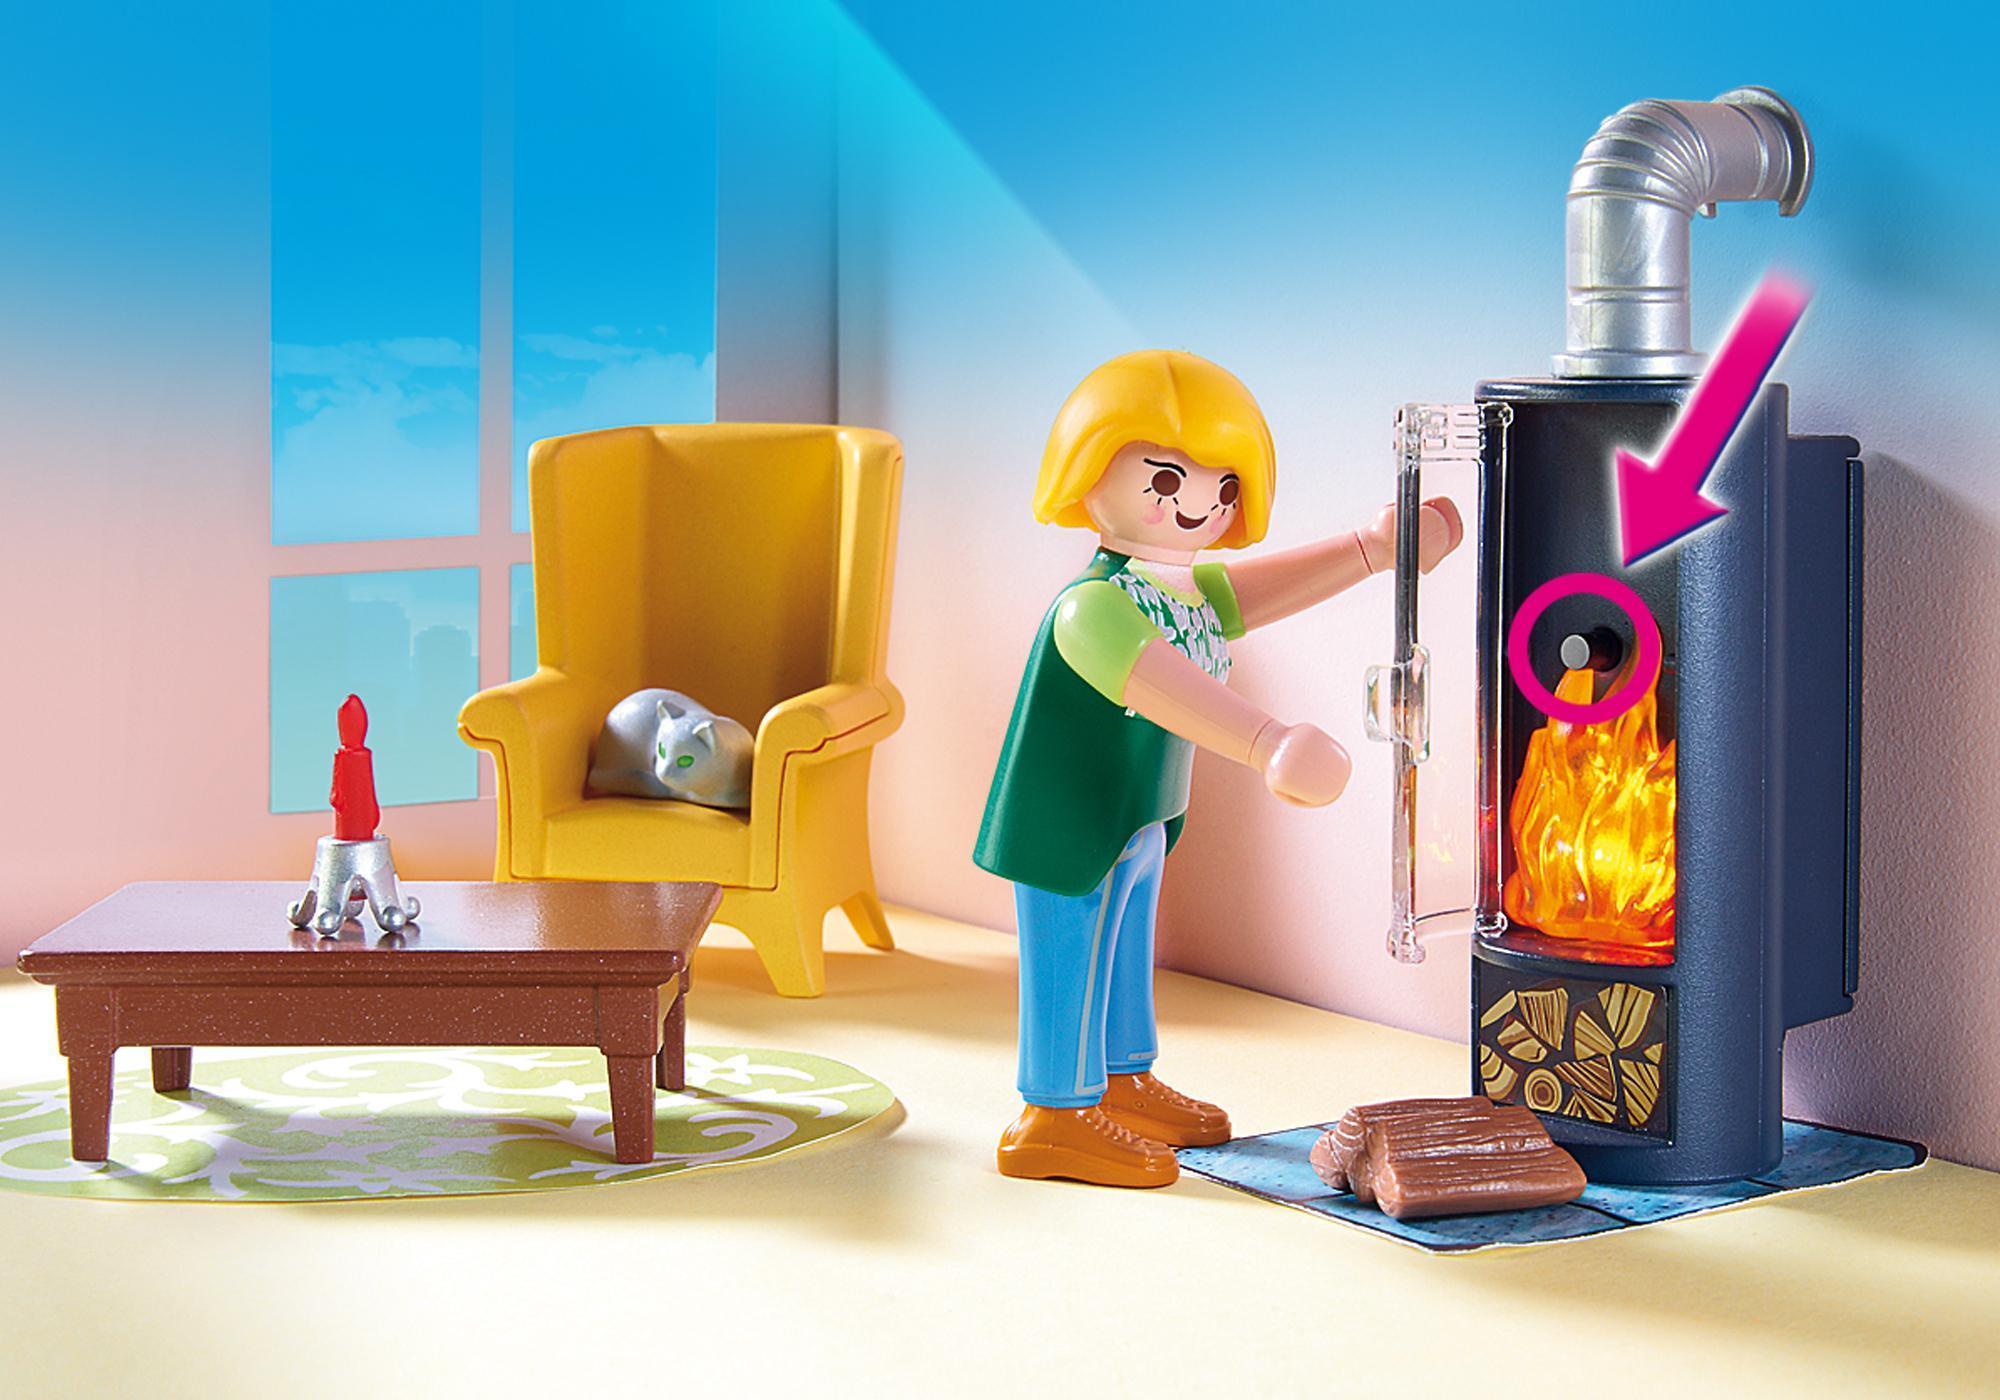 http://media.playmobil.com/i/playmobil/5308_product_extra1/Sala de Estar con Fuego